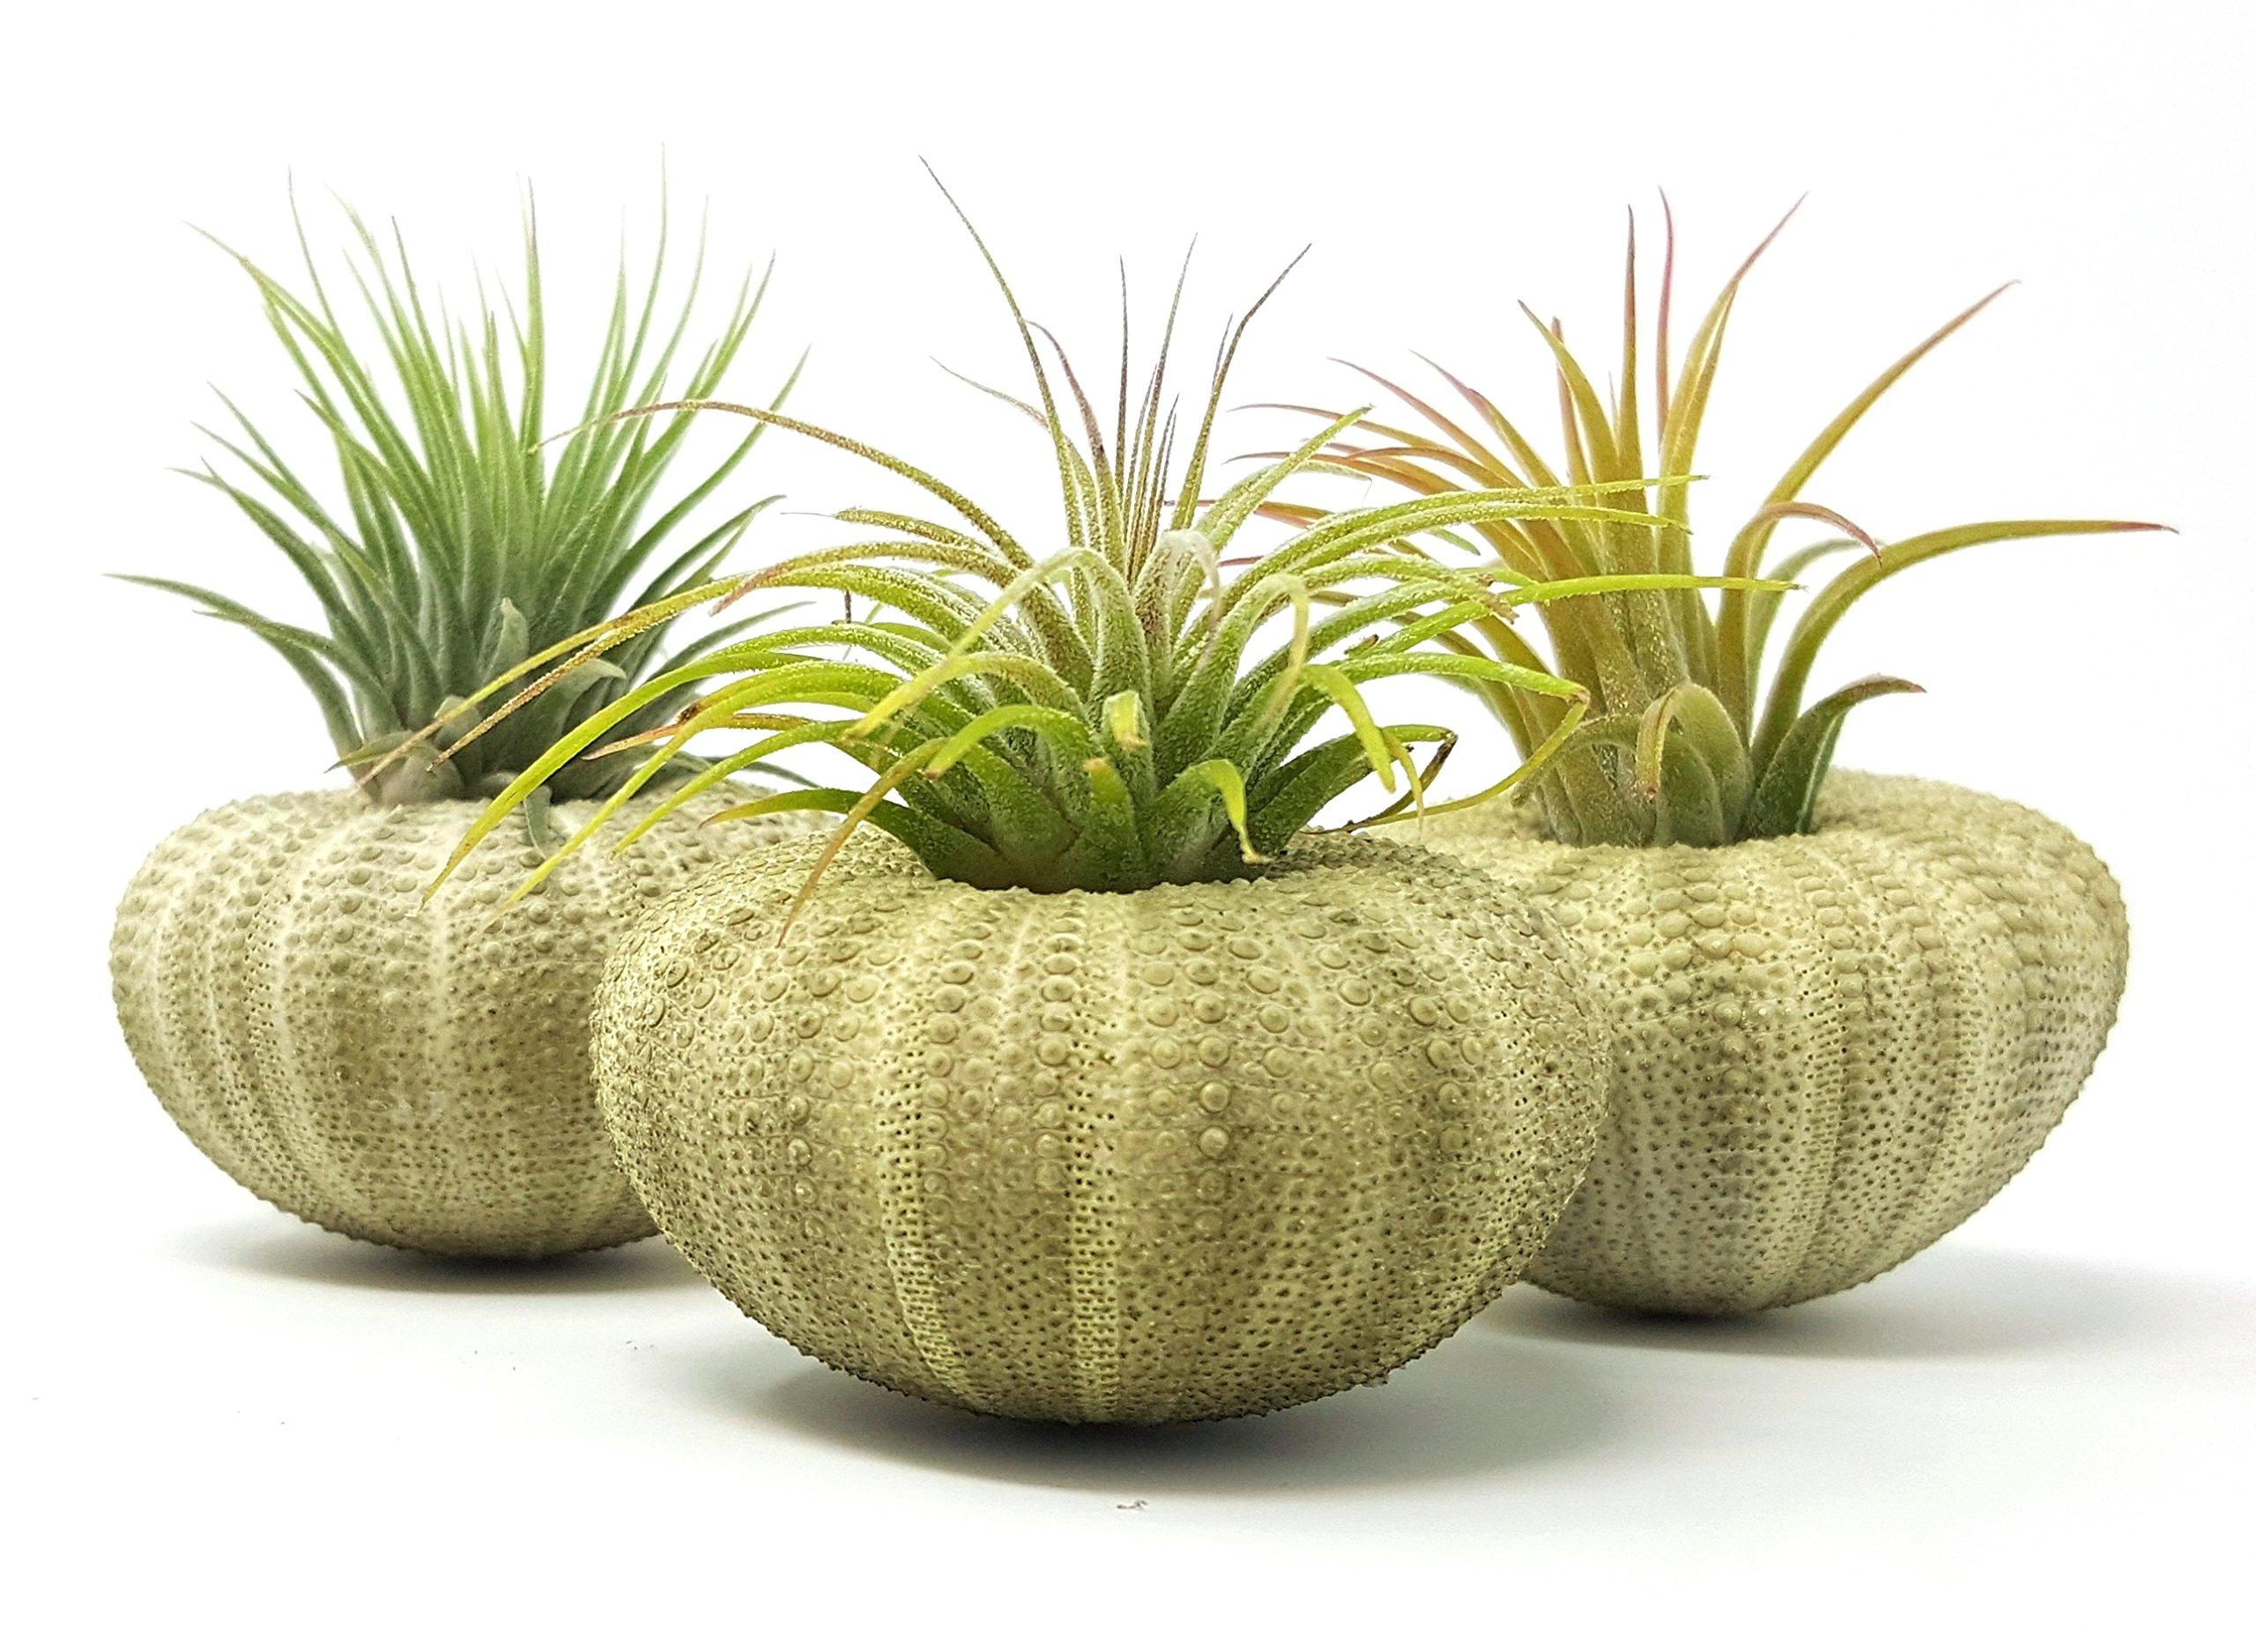 Aura Creations 3 pcs Green Sea Urchin Air Plant Lot/Kit Includes 3 Tillandsia Plants and 3 Urchin shells